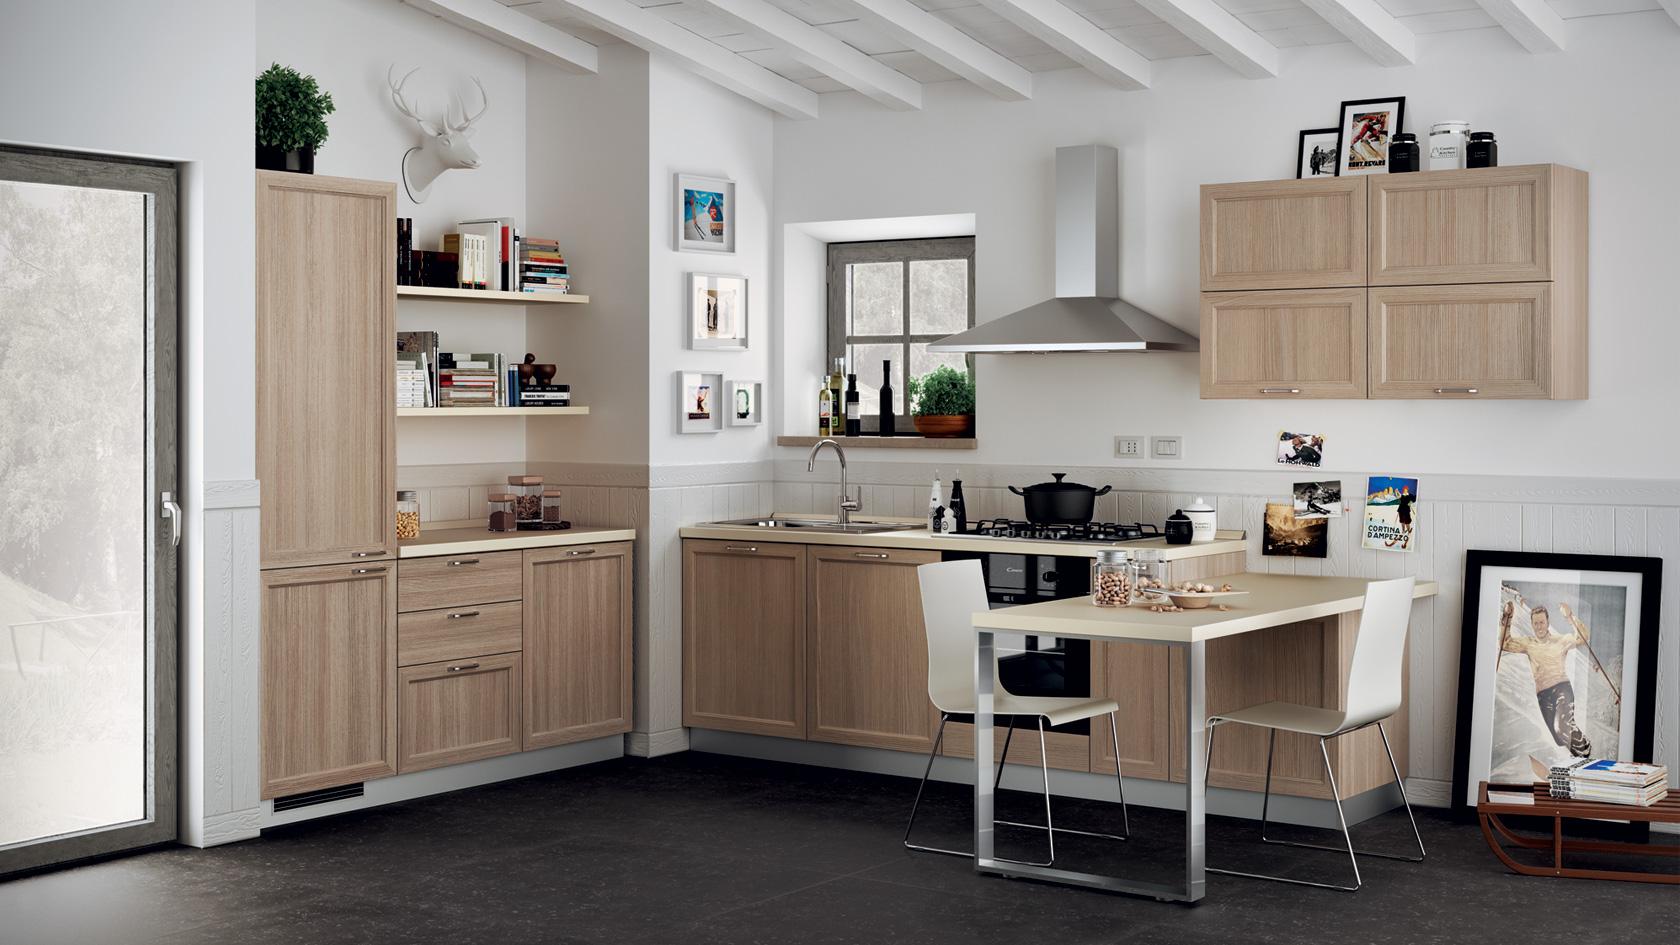 Highland Kitchen  Dillon Amber Dane Kitchen Cabinets Barbados